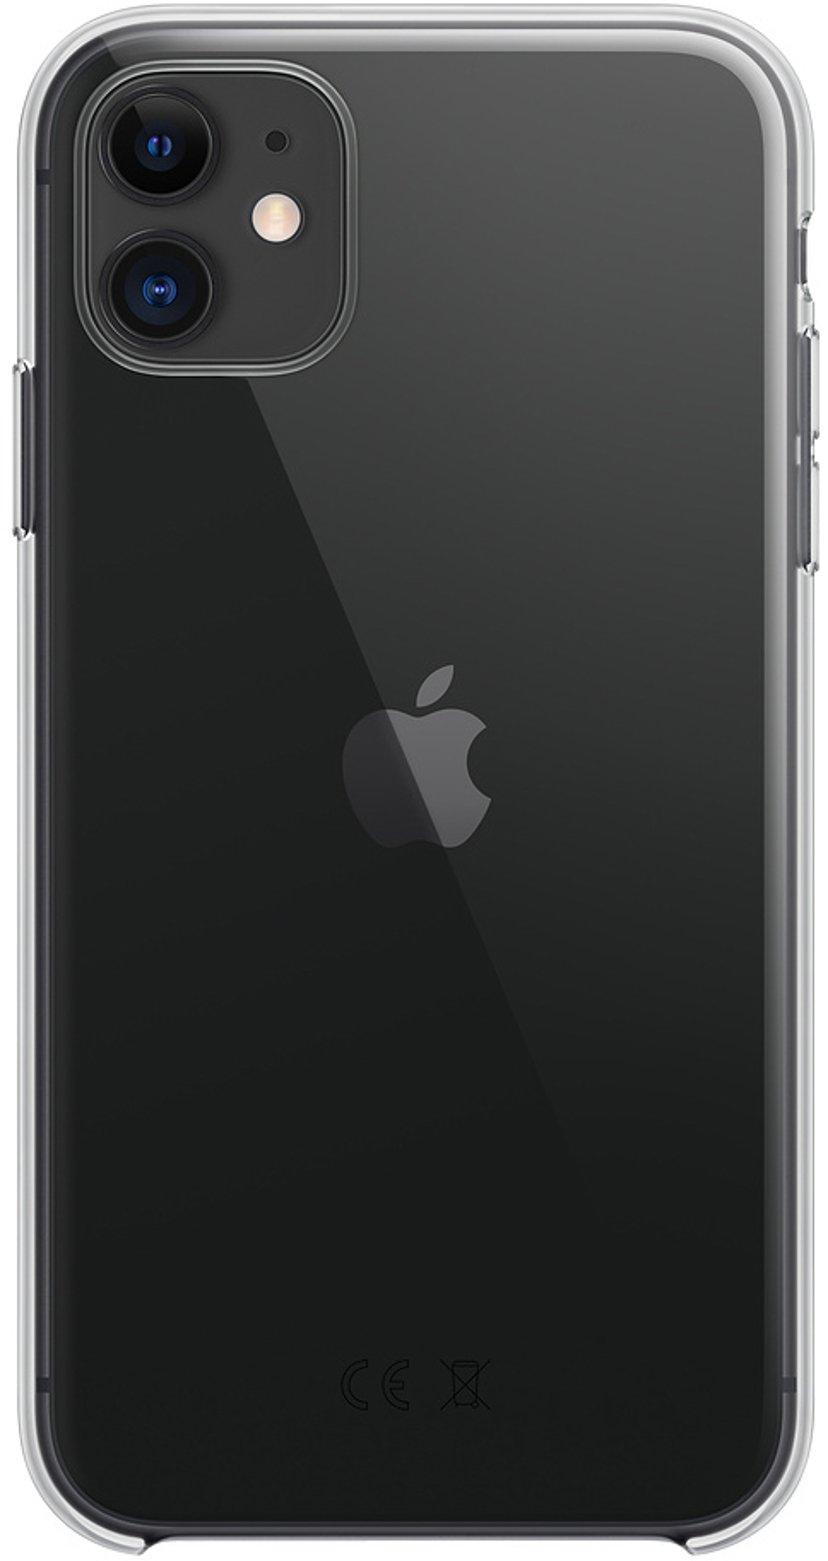 Apple Baksidedeksel for mobiltelefon iPhone 11 Blank